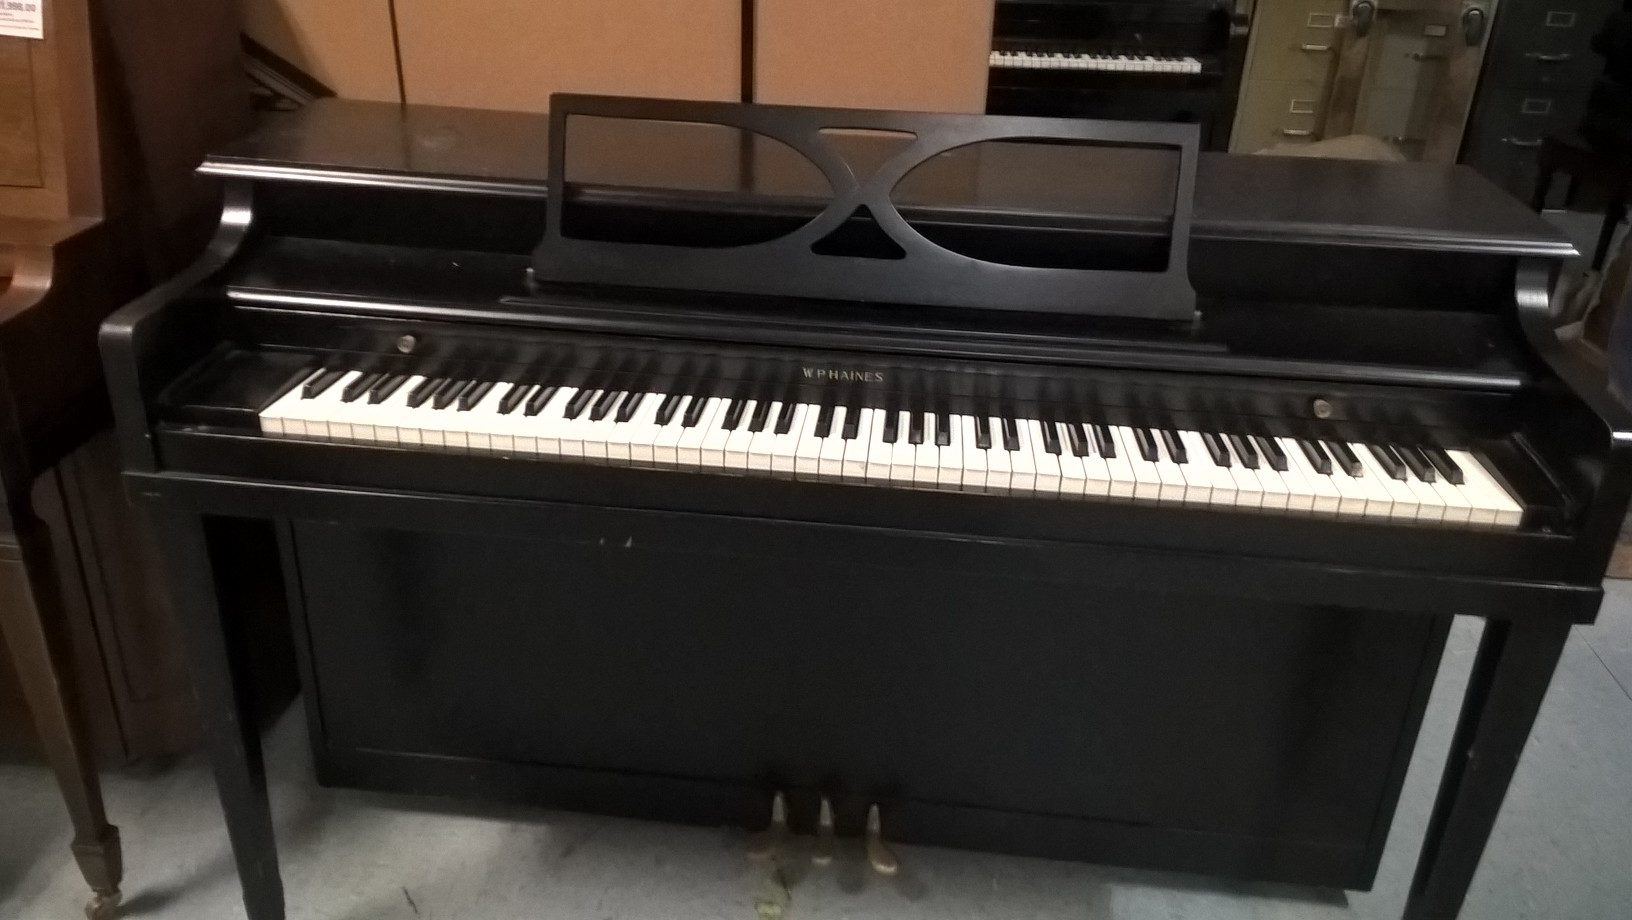 WP Haynes Spinet Piano - Just $698